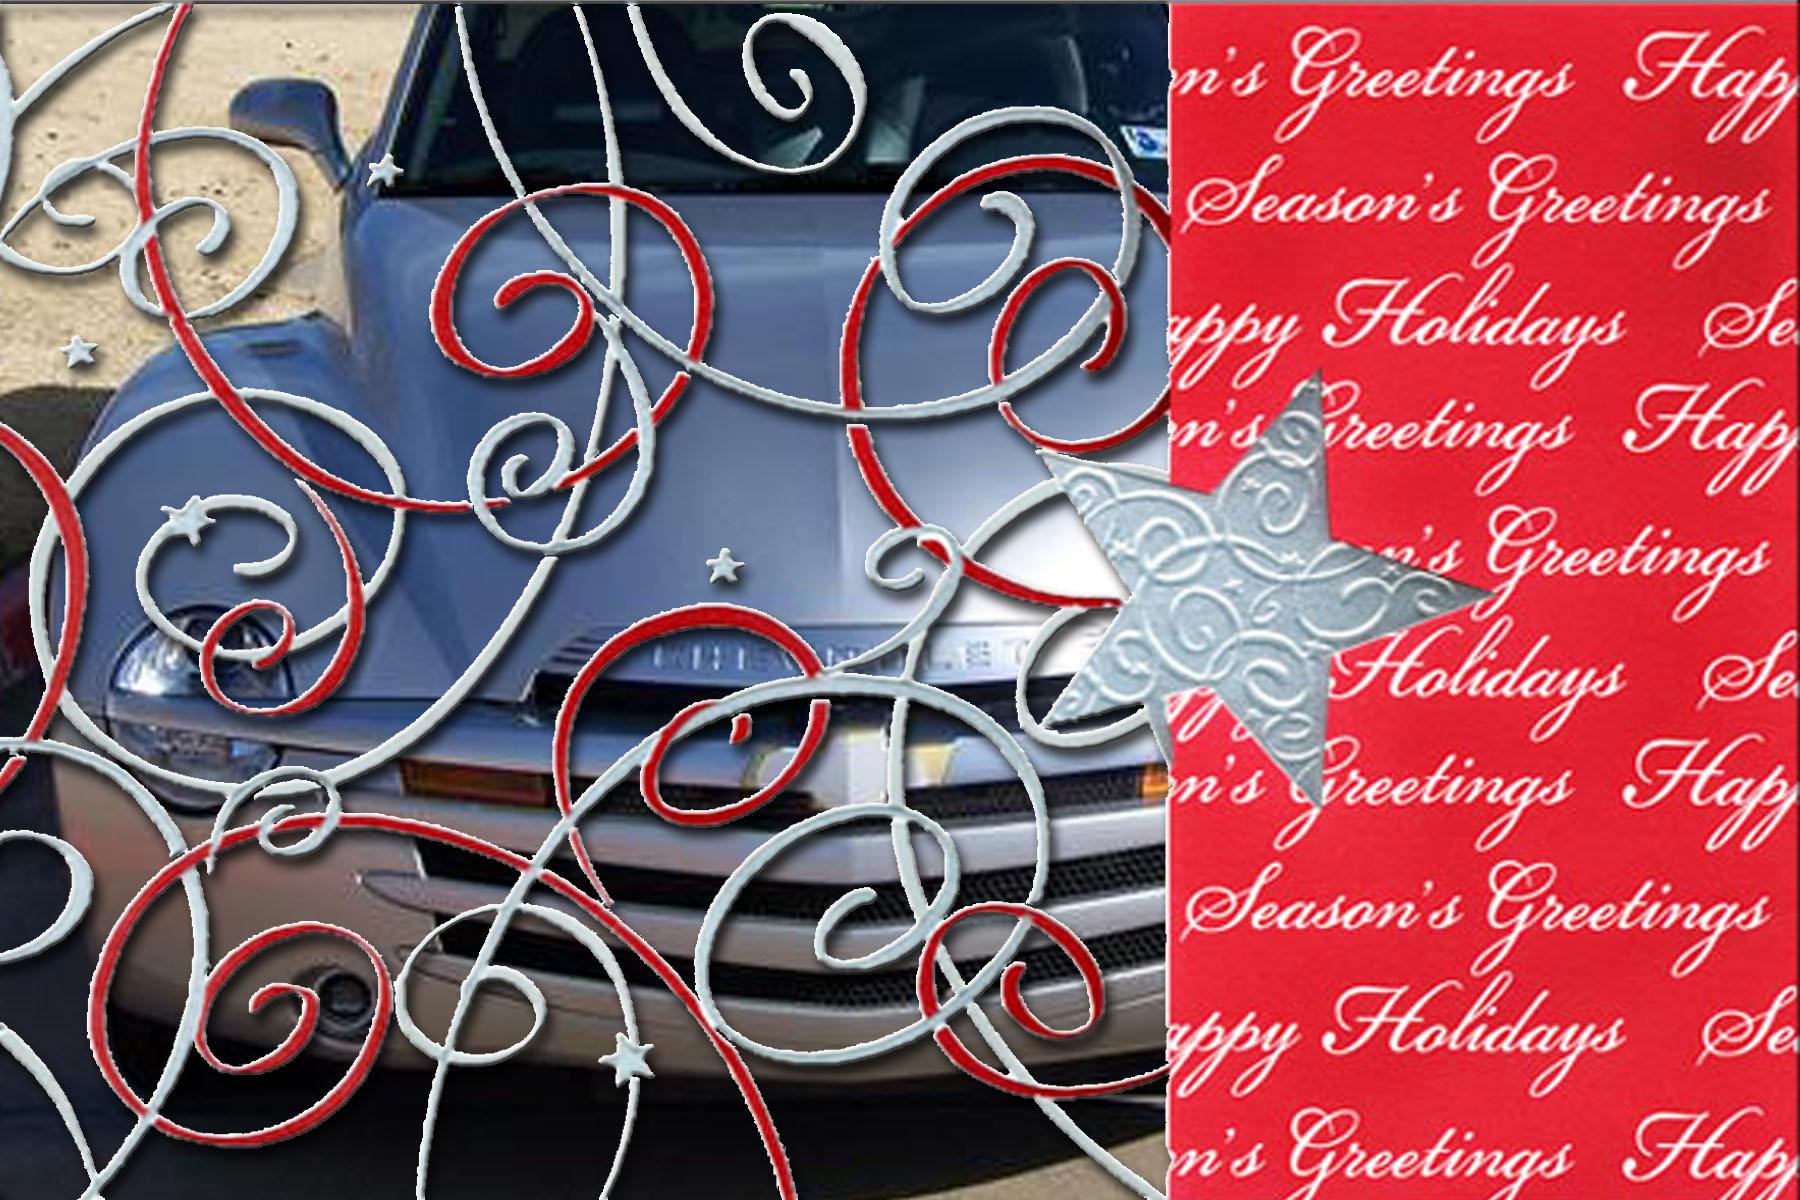 Christmas SSR Theme Pics?-untitled-1.jpg